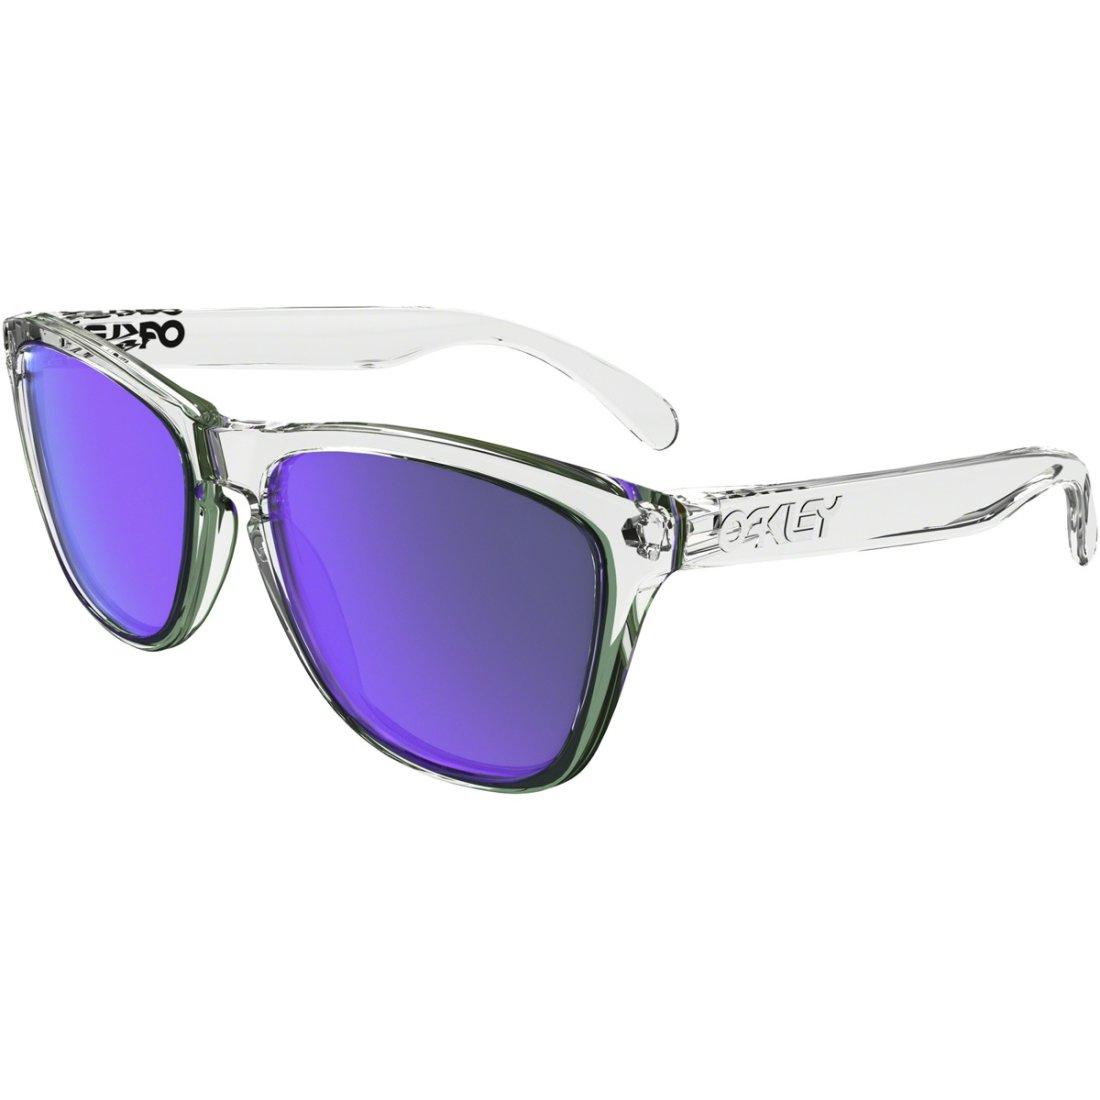 9097f33658 OAKLEY Frogskins Polished Clear   Violet Iridium Mask   Goggle · Motocard